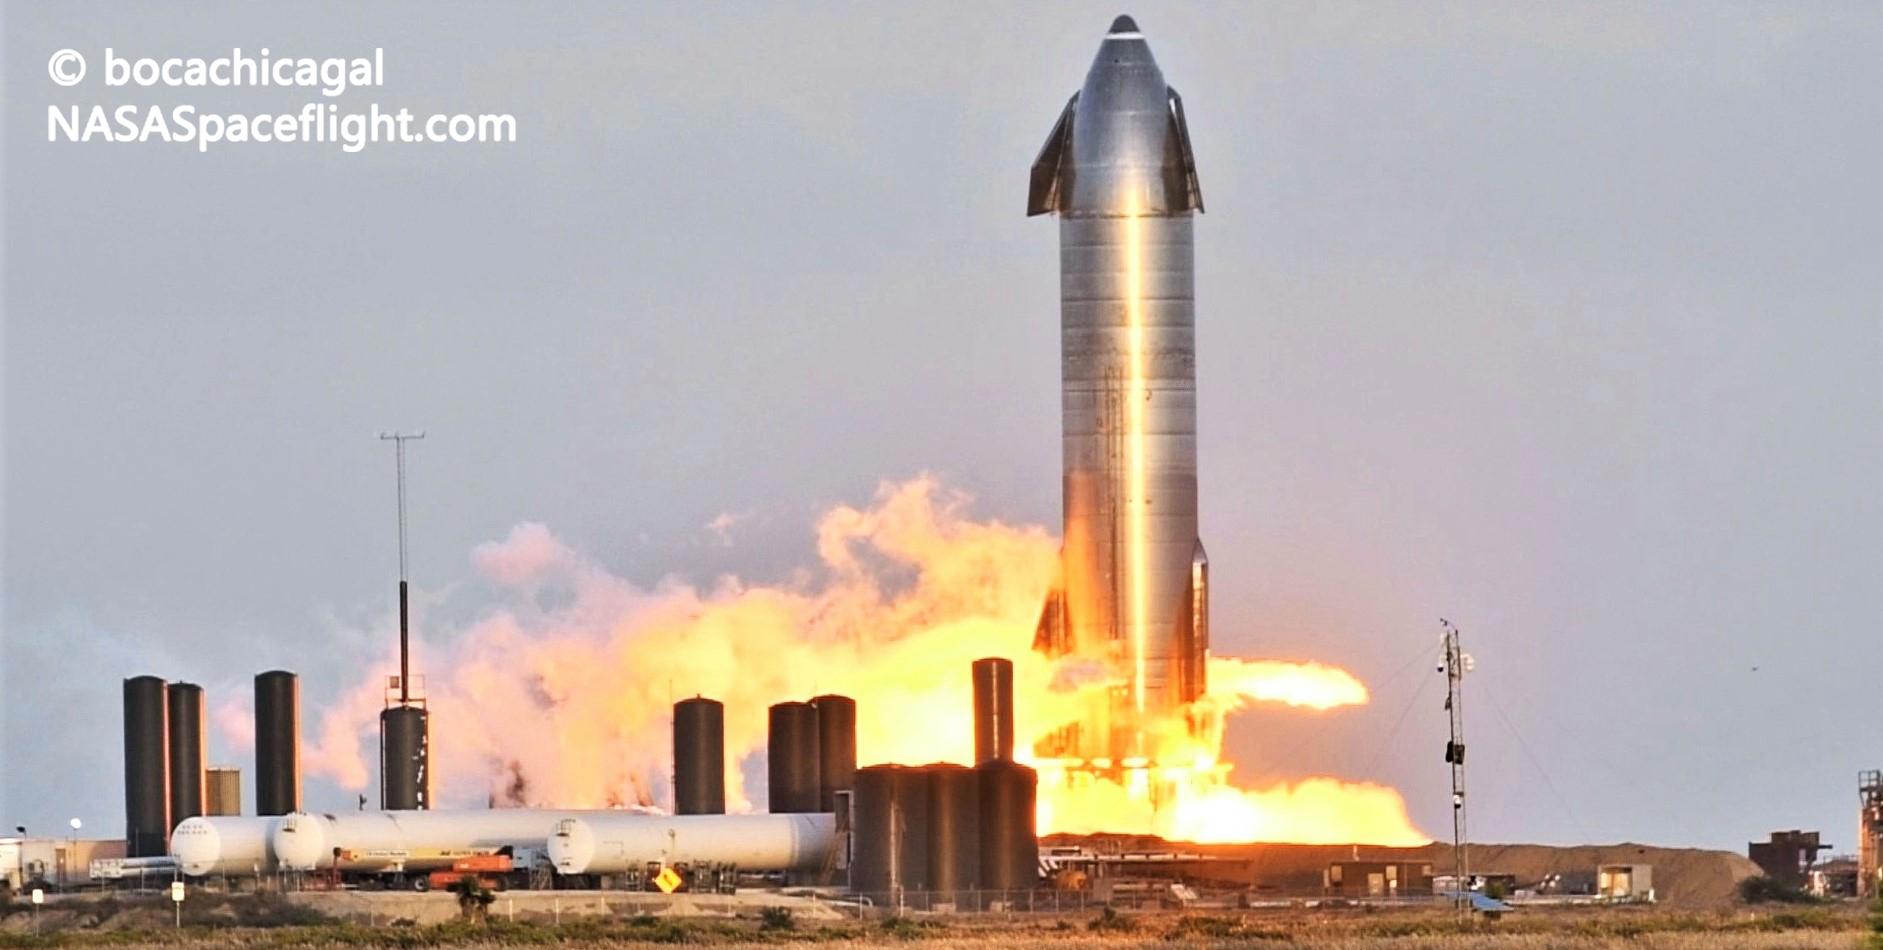 Starship Boca Chica 112420 (NASASpaceflight – bocachicagal) SN8 static fire #4 4